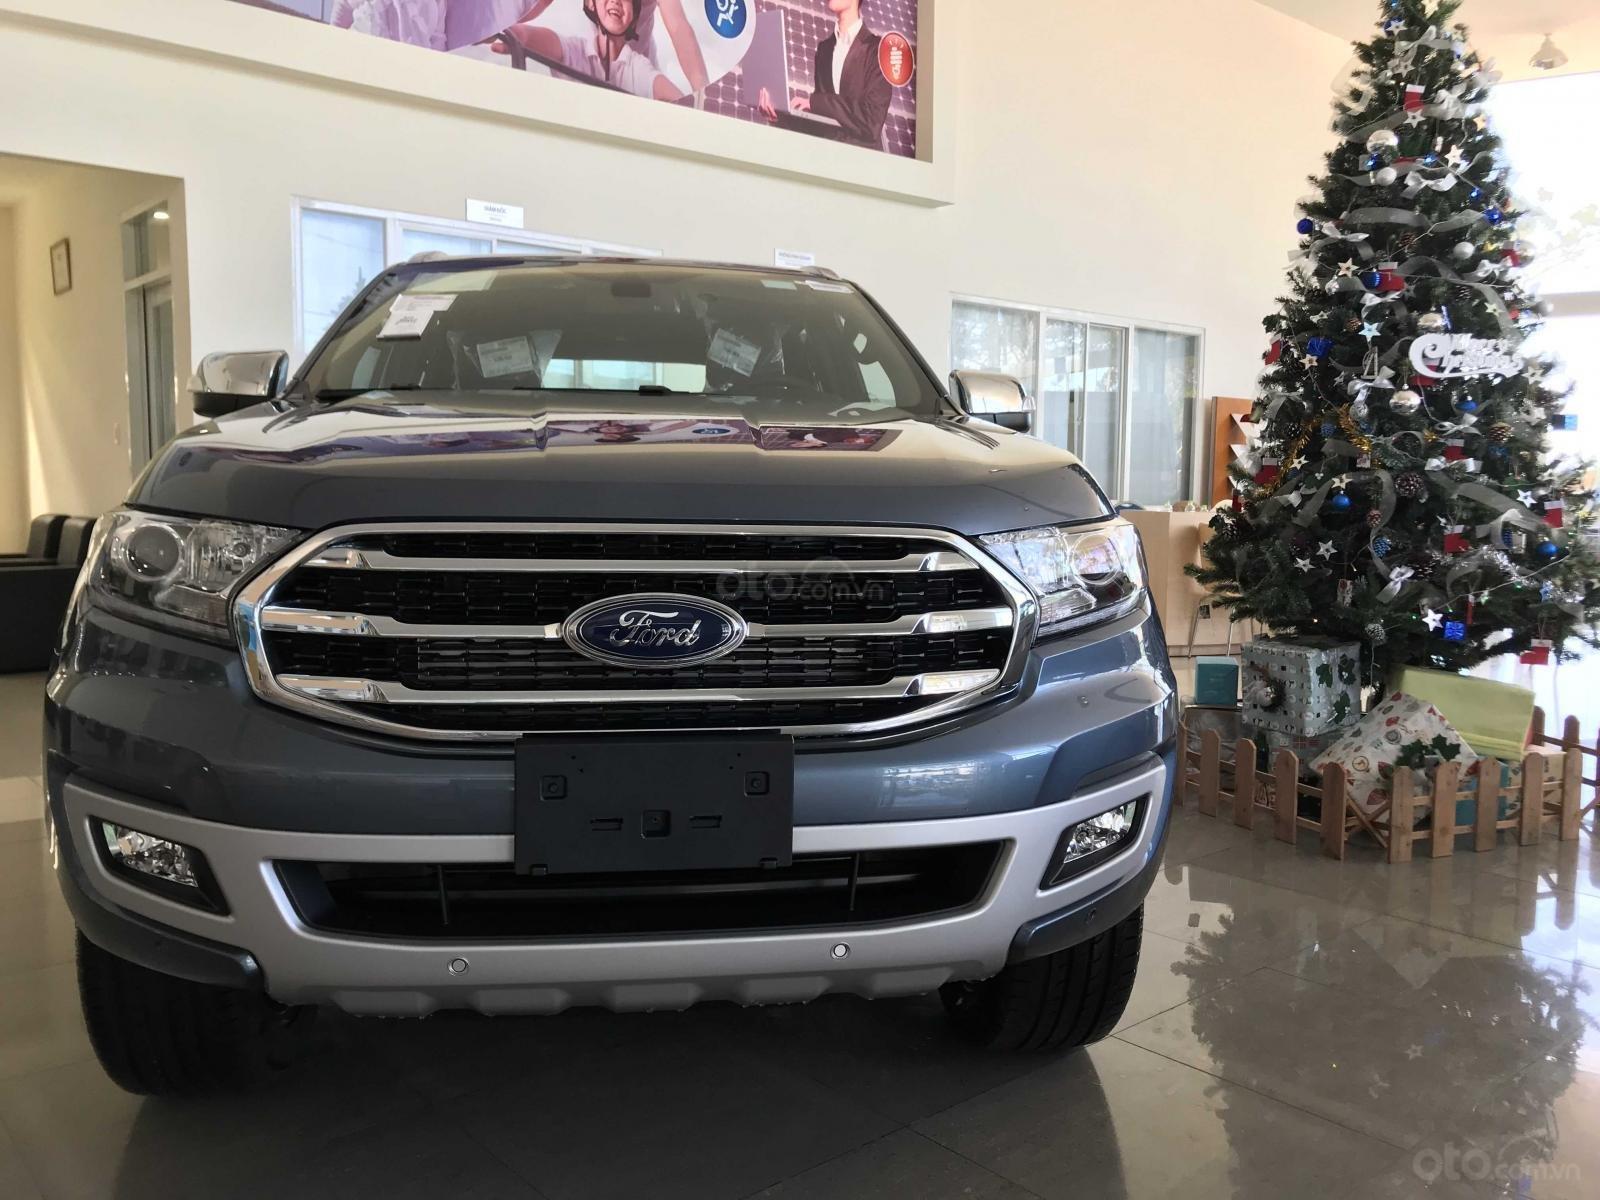 Ford Everest Titanium 2019 nhập khẩu giá tốt nhất (4)